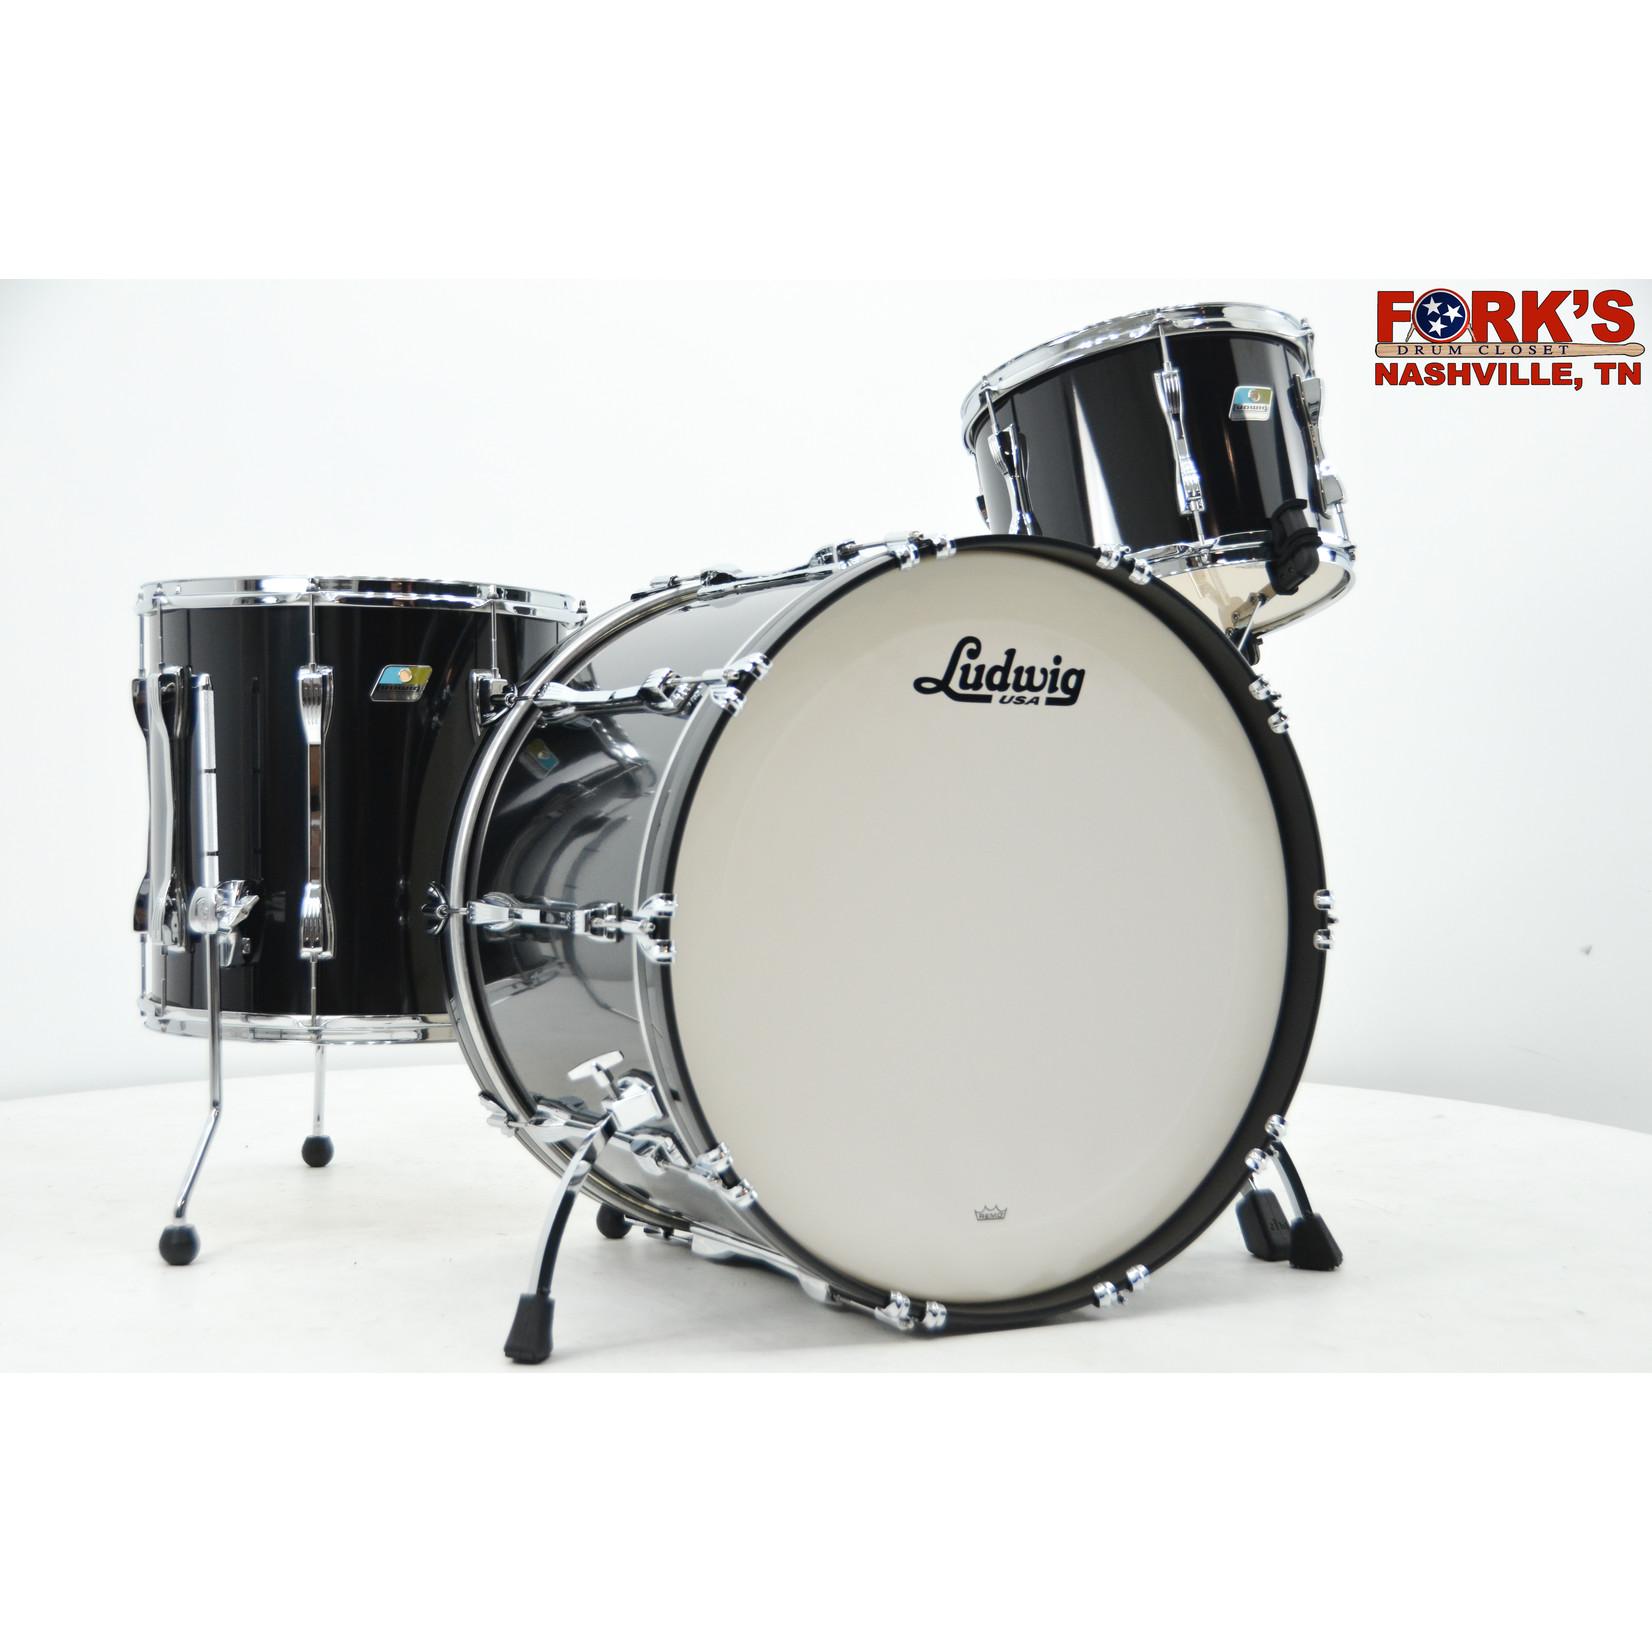 "Ludwig Ludwig Classic Maple 3pc Drum Kit - ""Black Cortex"""